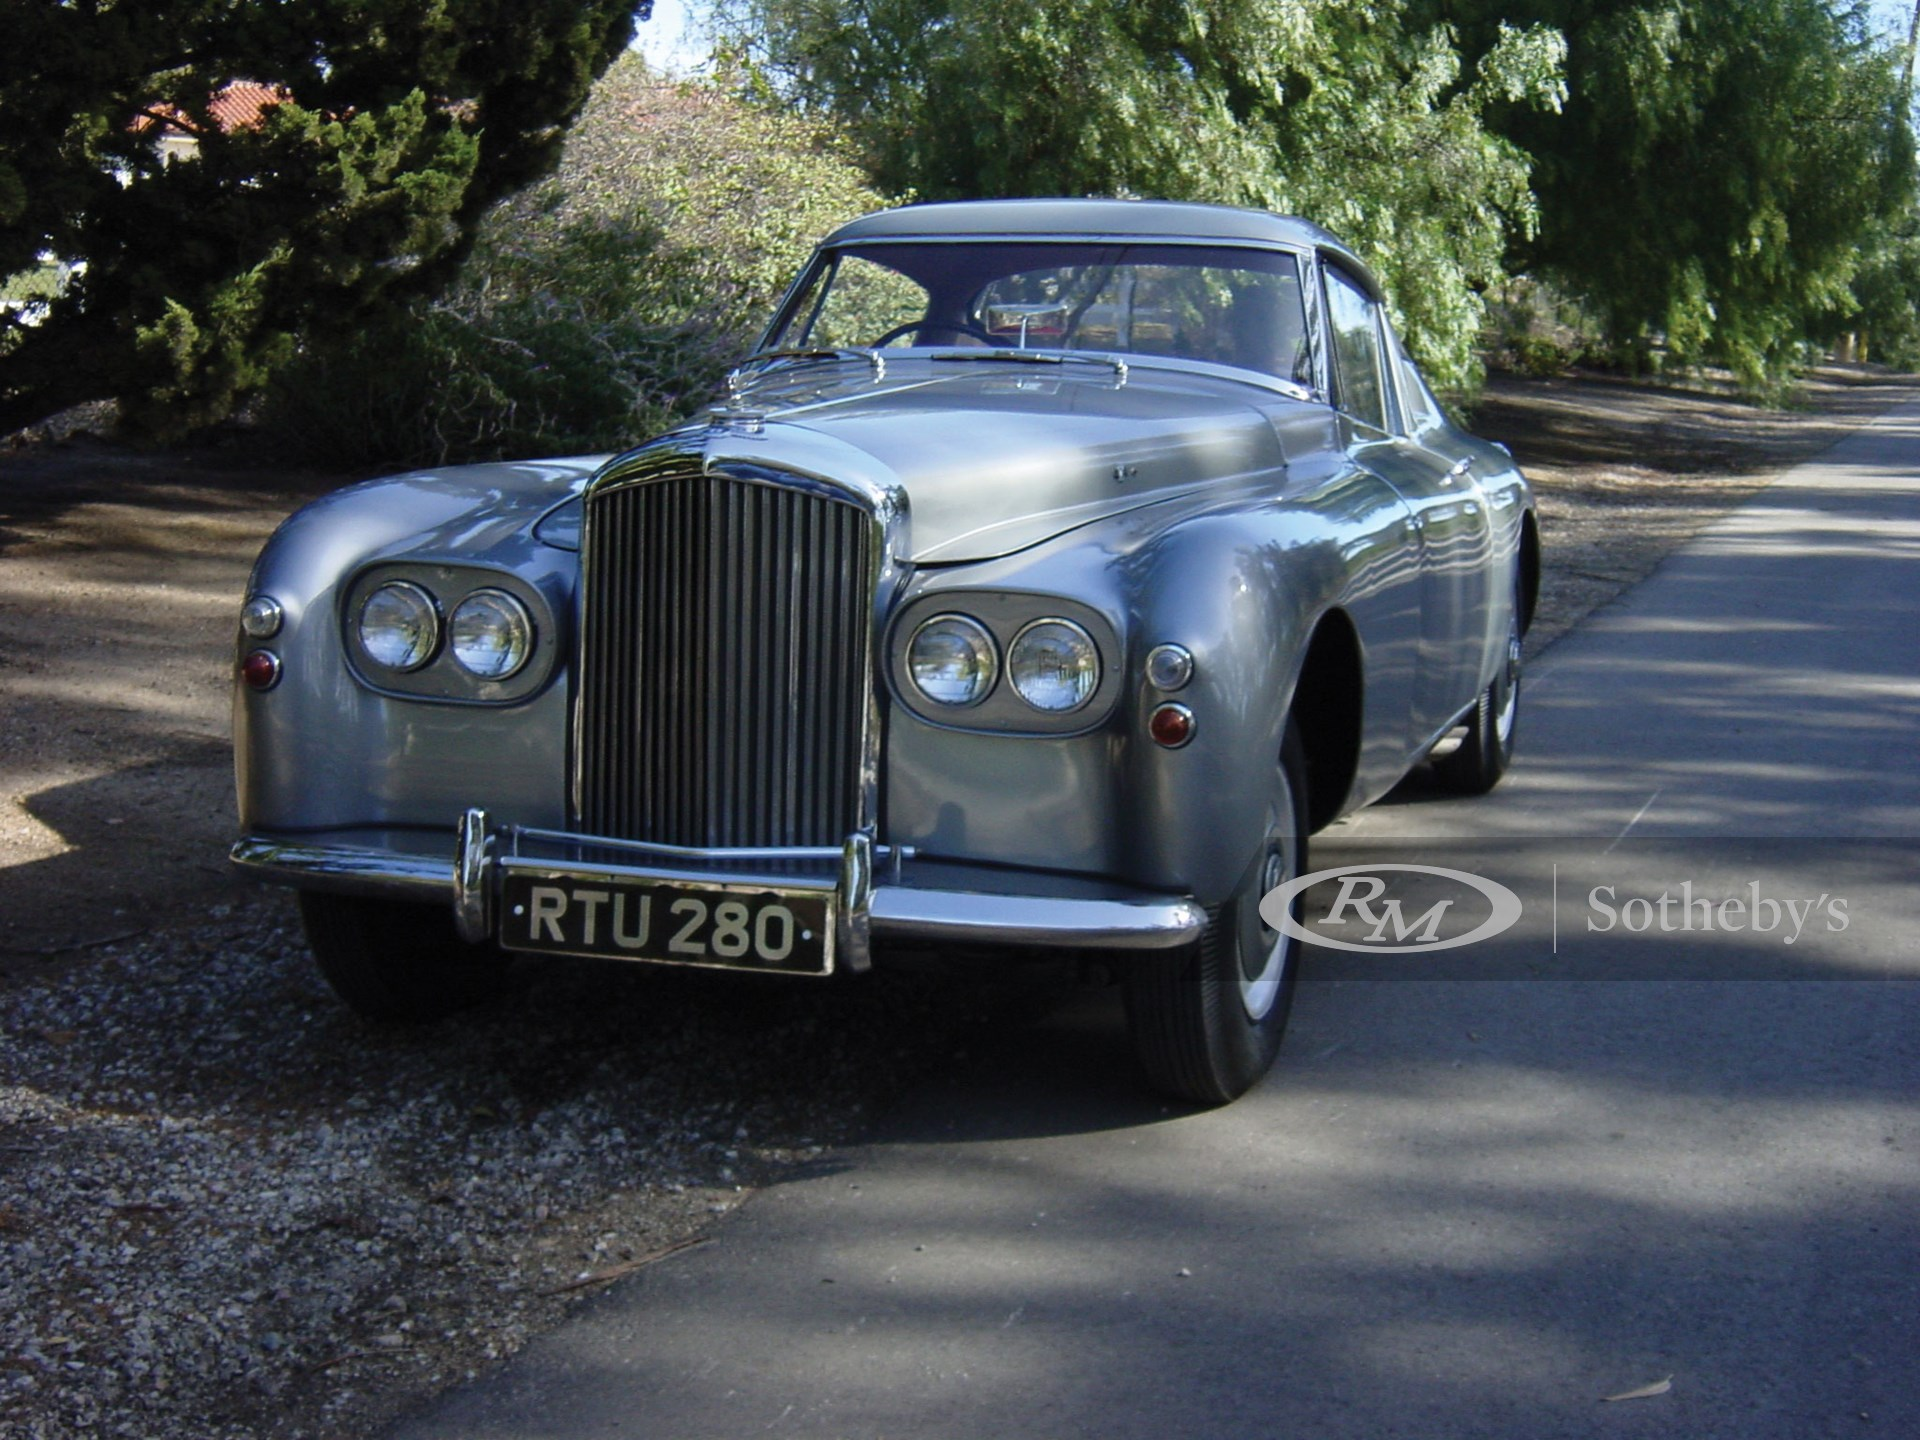 1954 Bentley R-Type Lightweight Coupe